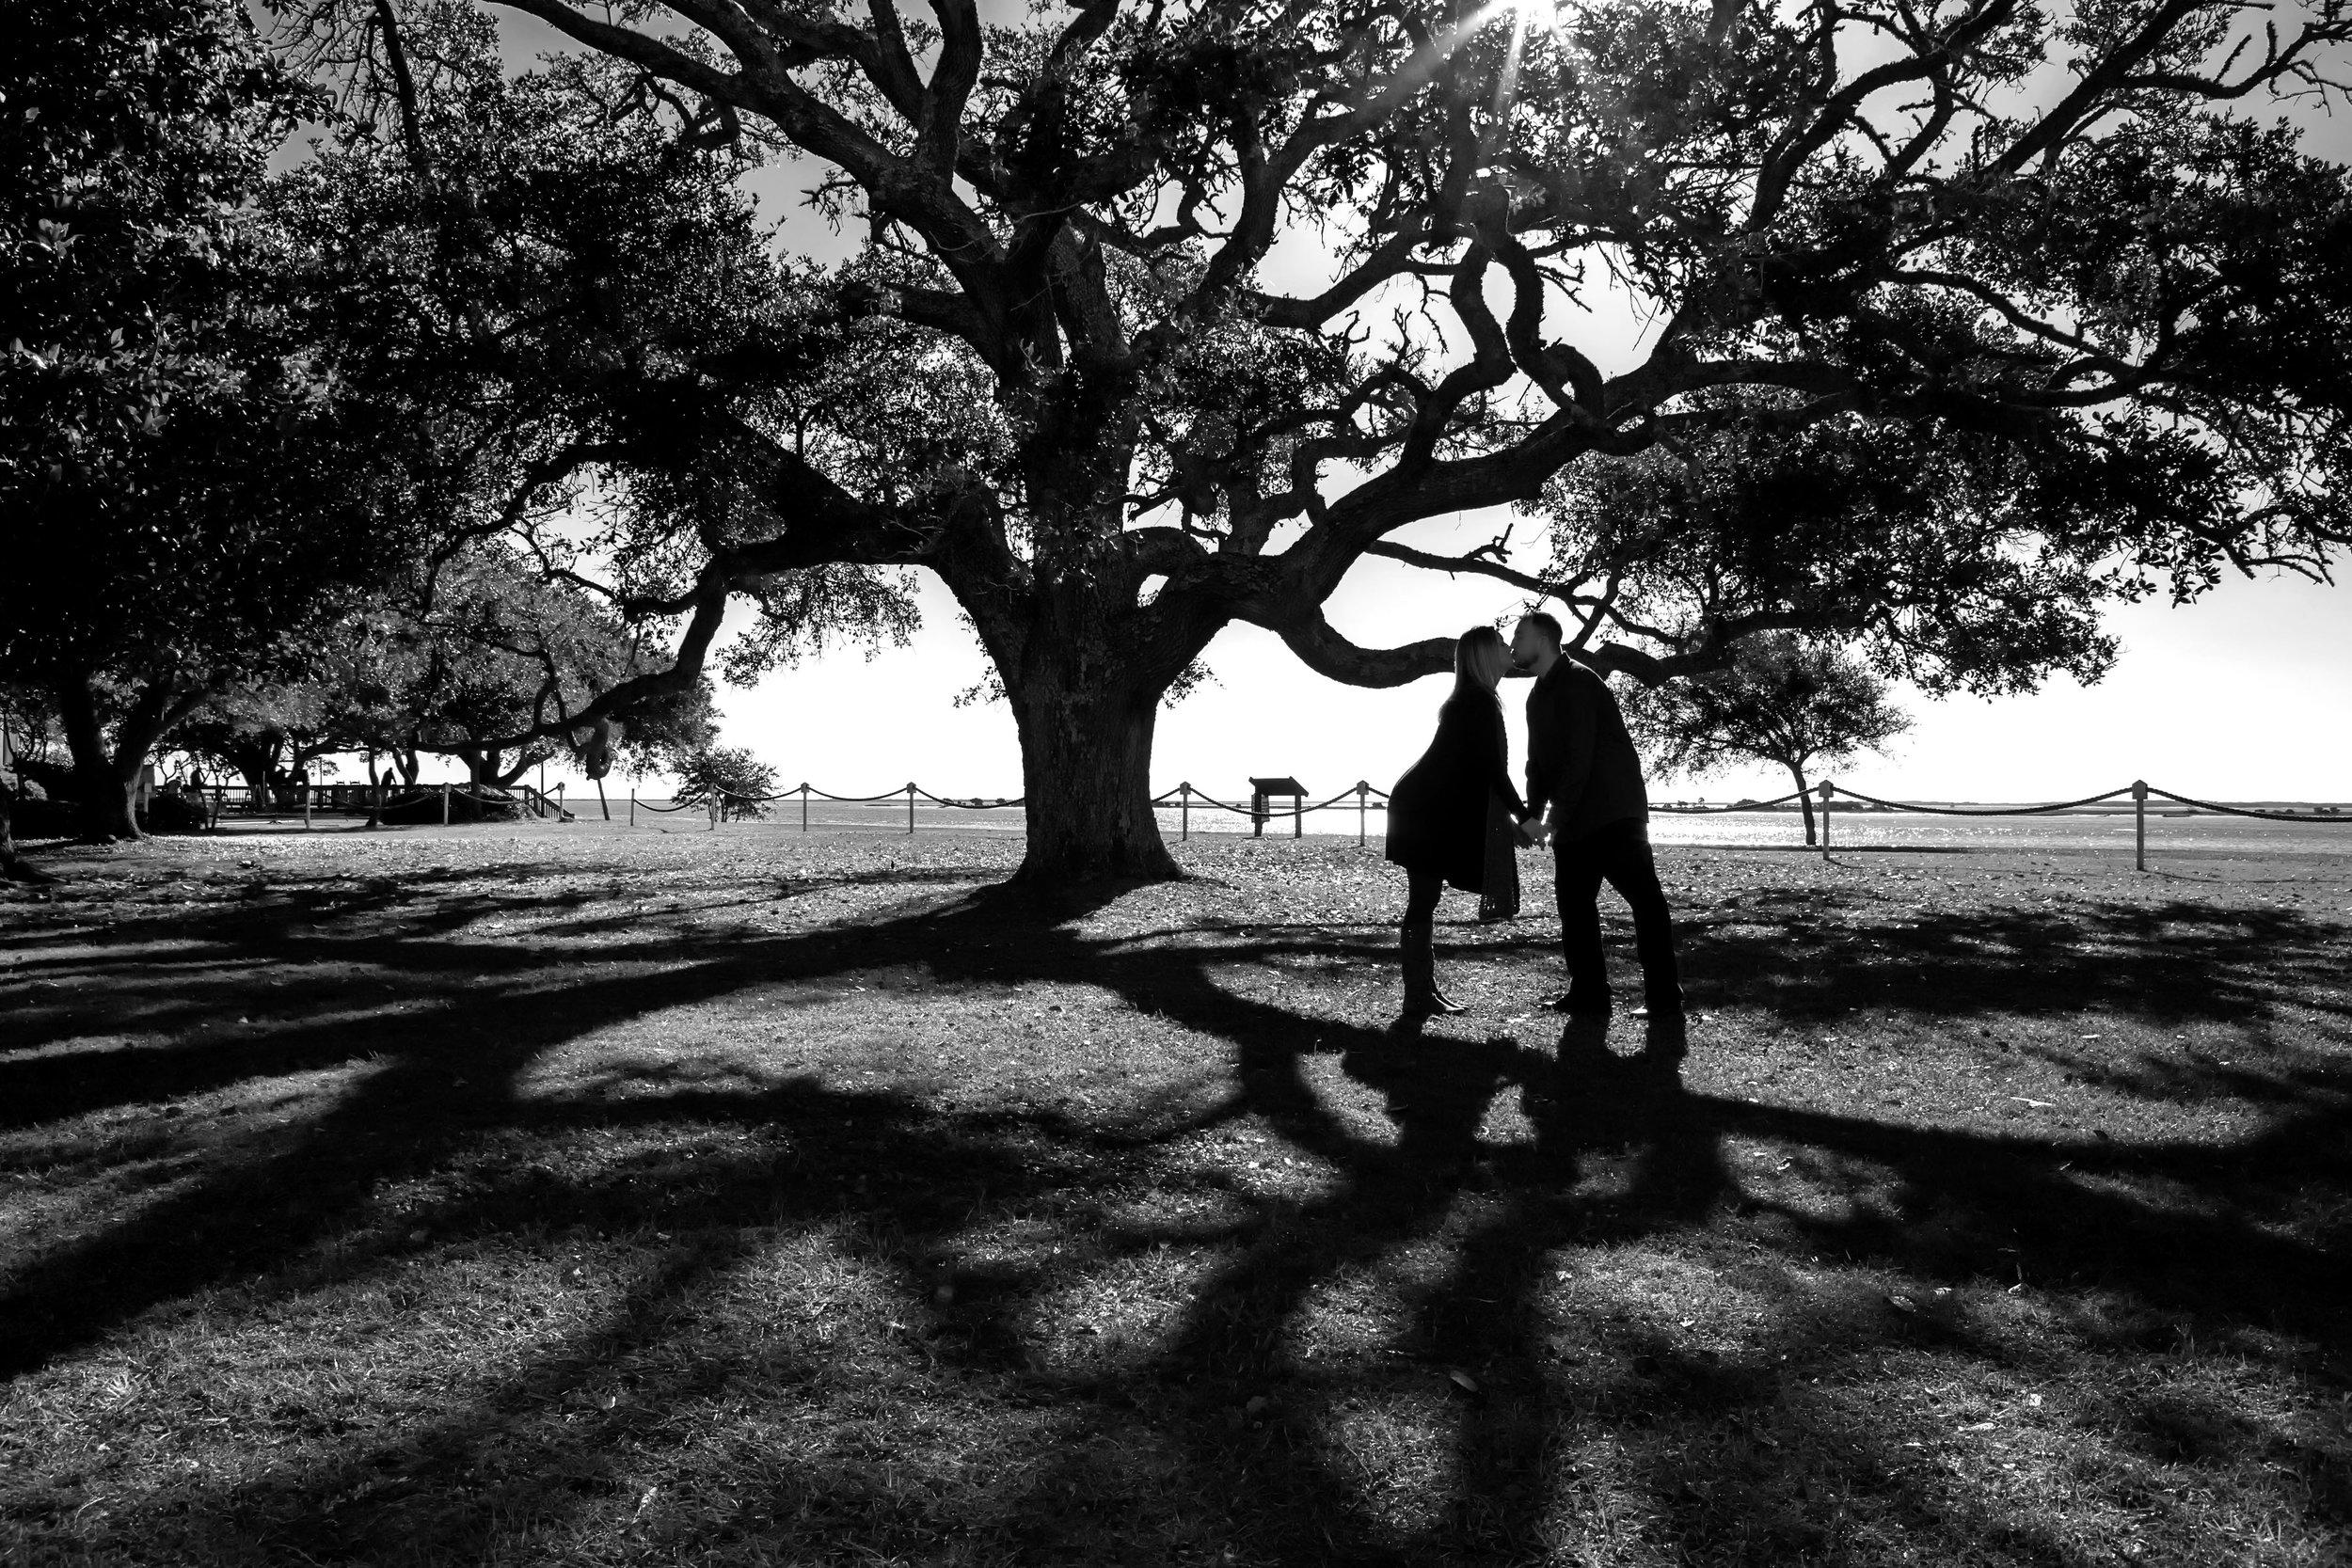 NC_WEDDING_PHOTOGRAPHER_SOUTHPORT_ENGAGEMENT_TIFFANY_ABRUZZO_PHOTOGRAPHY_57.jpg